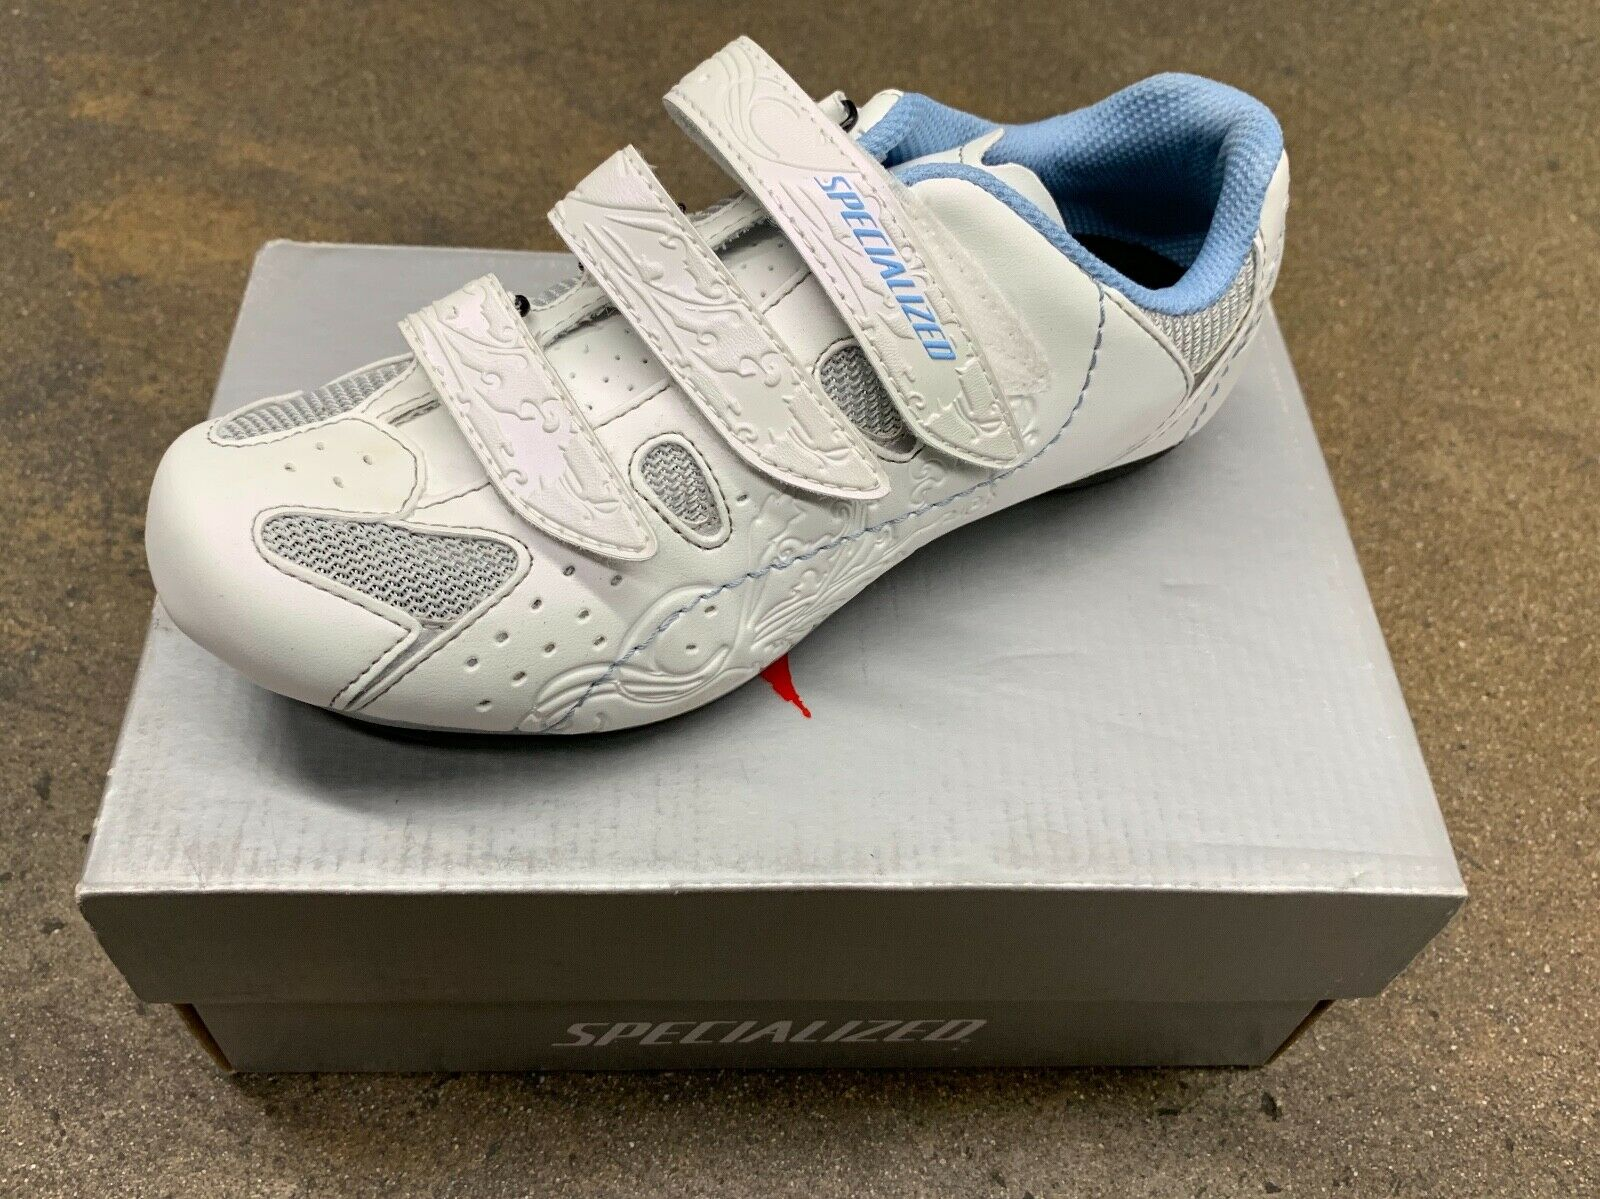 Specialized Women's Spirita  Road Bike shoes SPIN Size 38 EU   7.5 US NEW